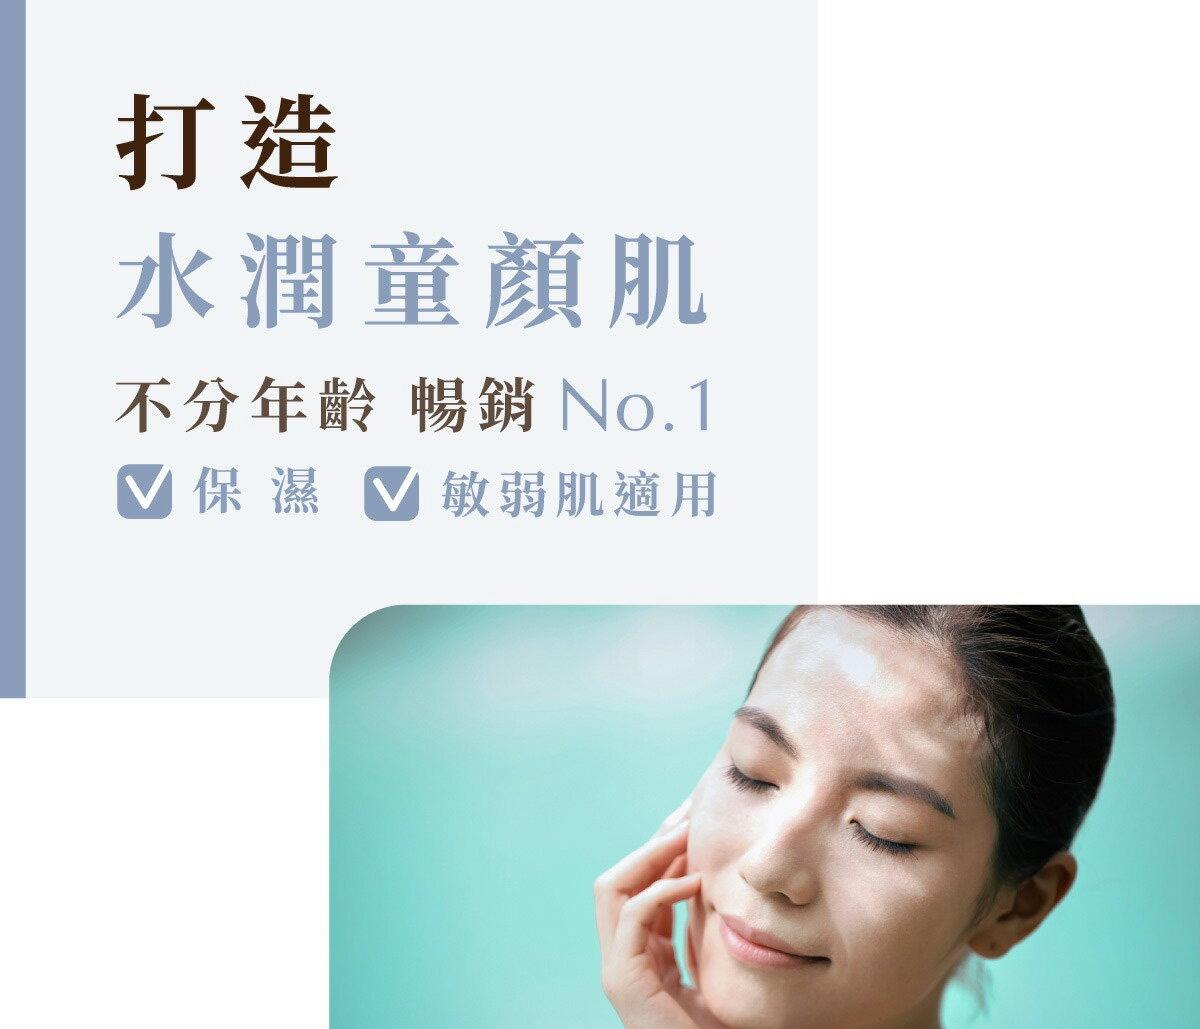 MIT👍滿額贈♥️【Inna Organic 童顏有機】沒藥水潤淨化隱形面膜 (1片) 3